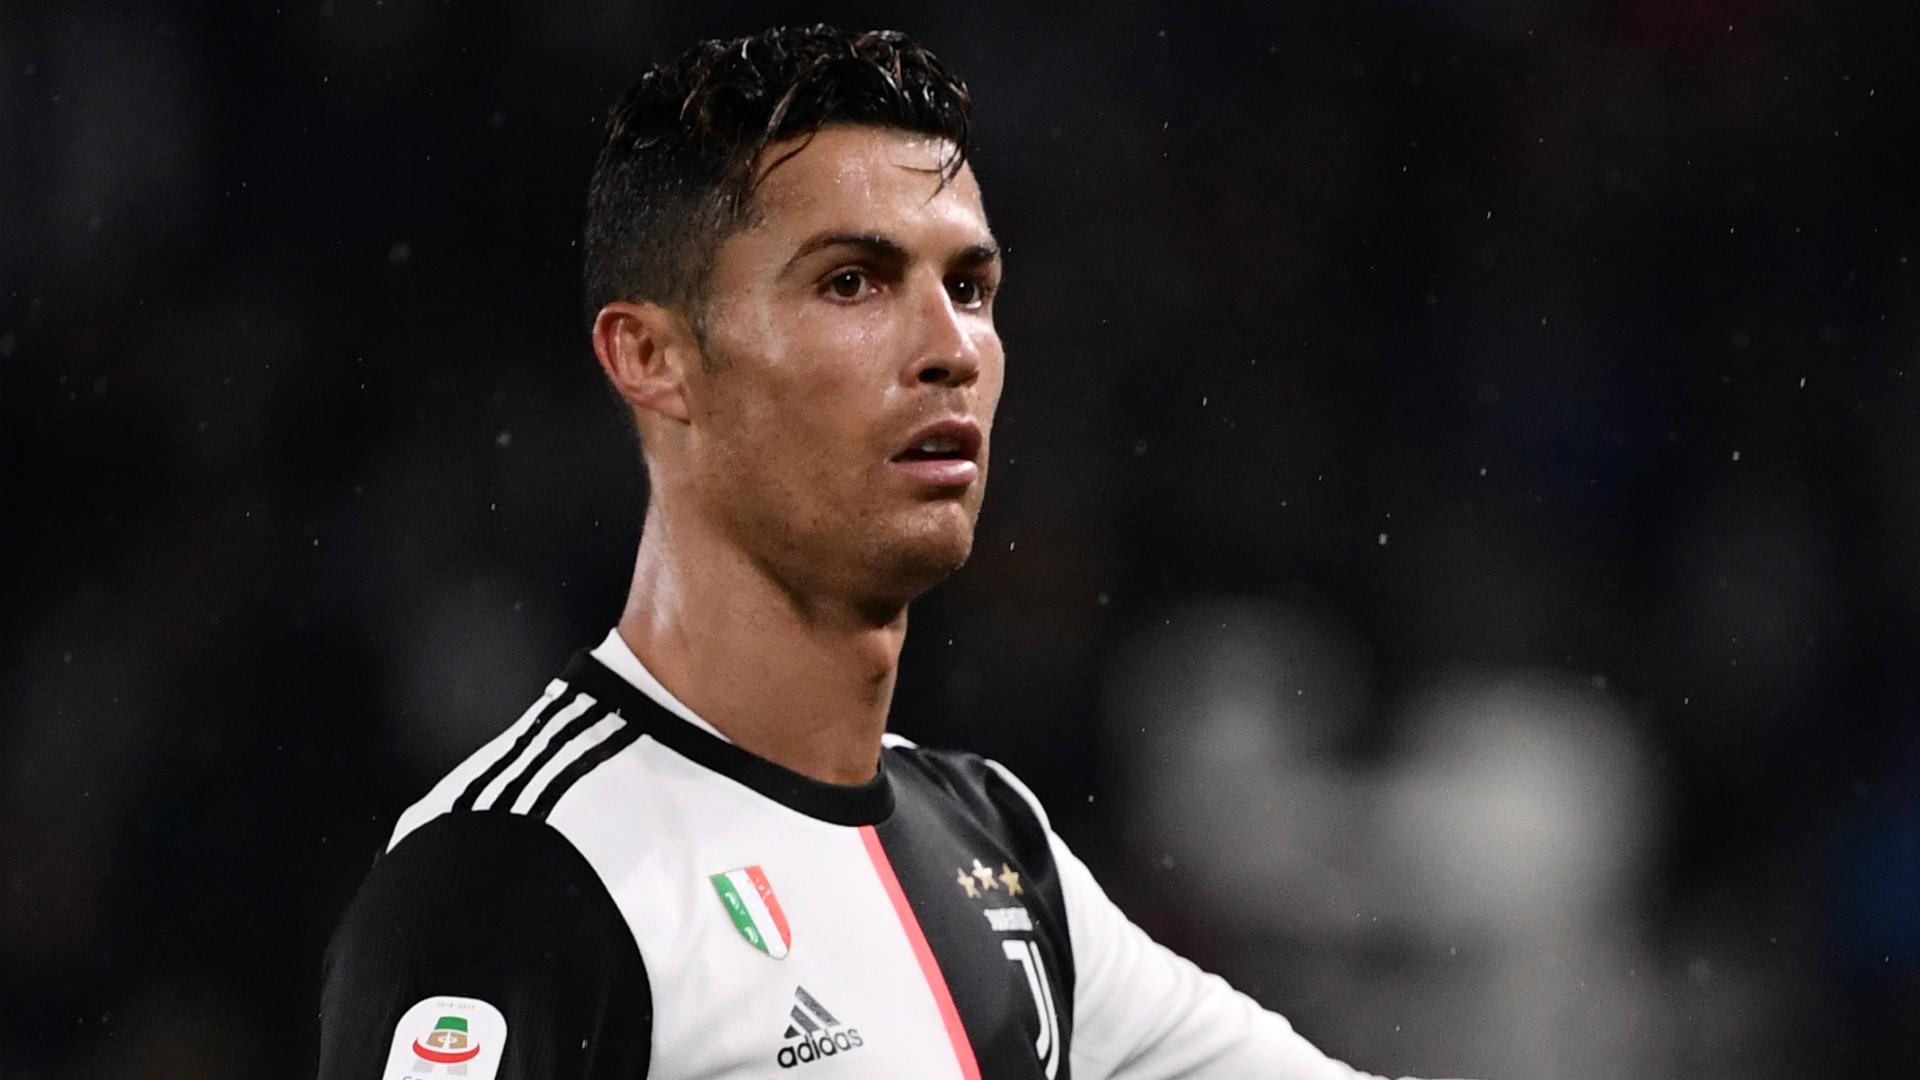 Ronaldo rape allegation: Case dropped as Las Vegas officials 'decline to prosecute'